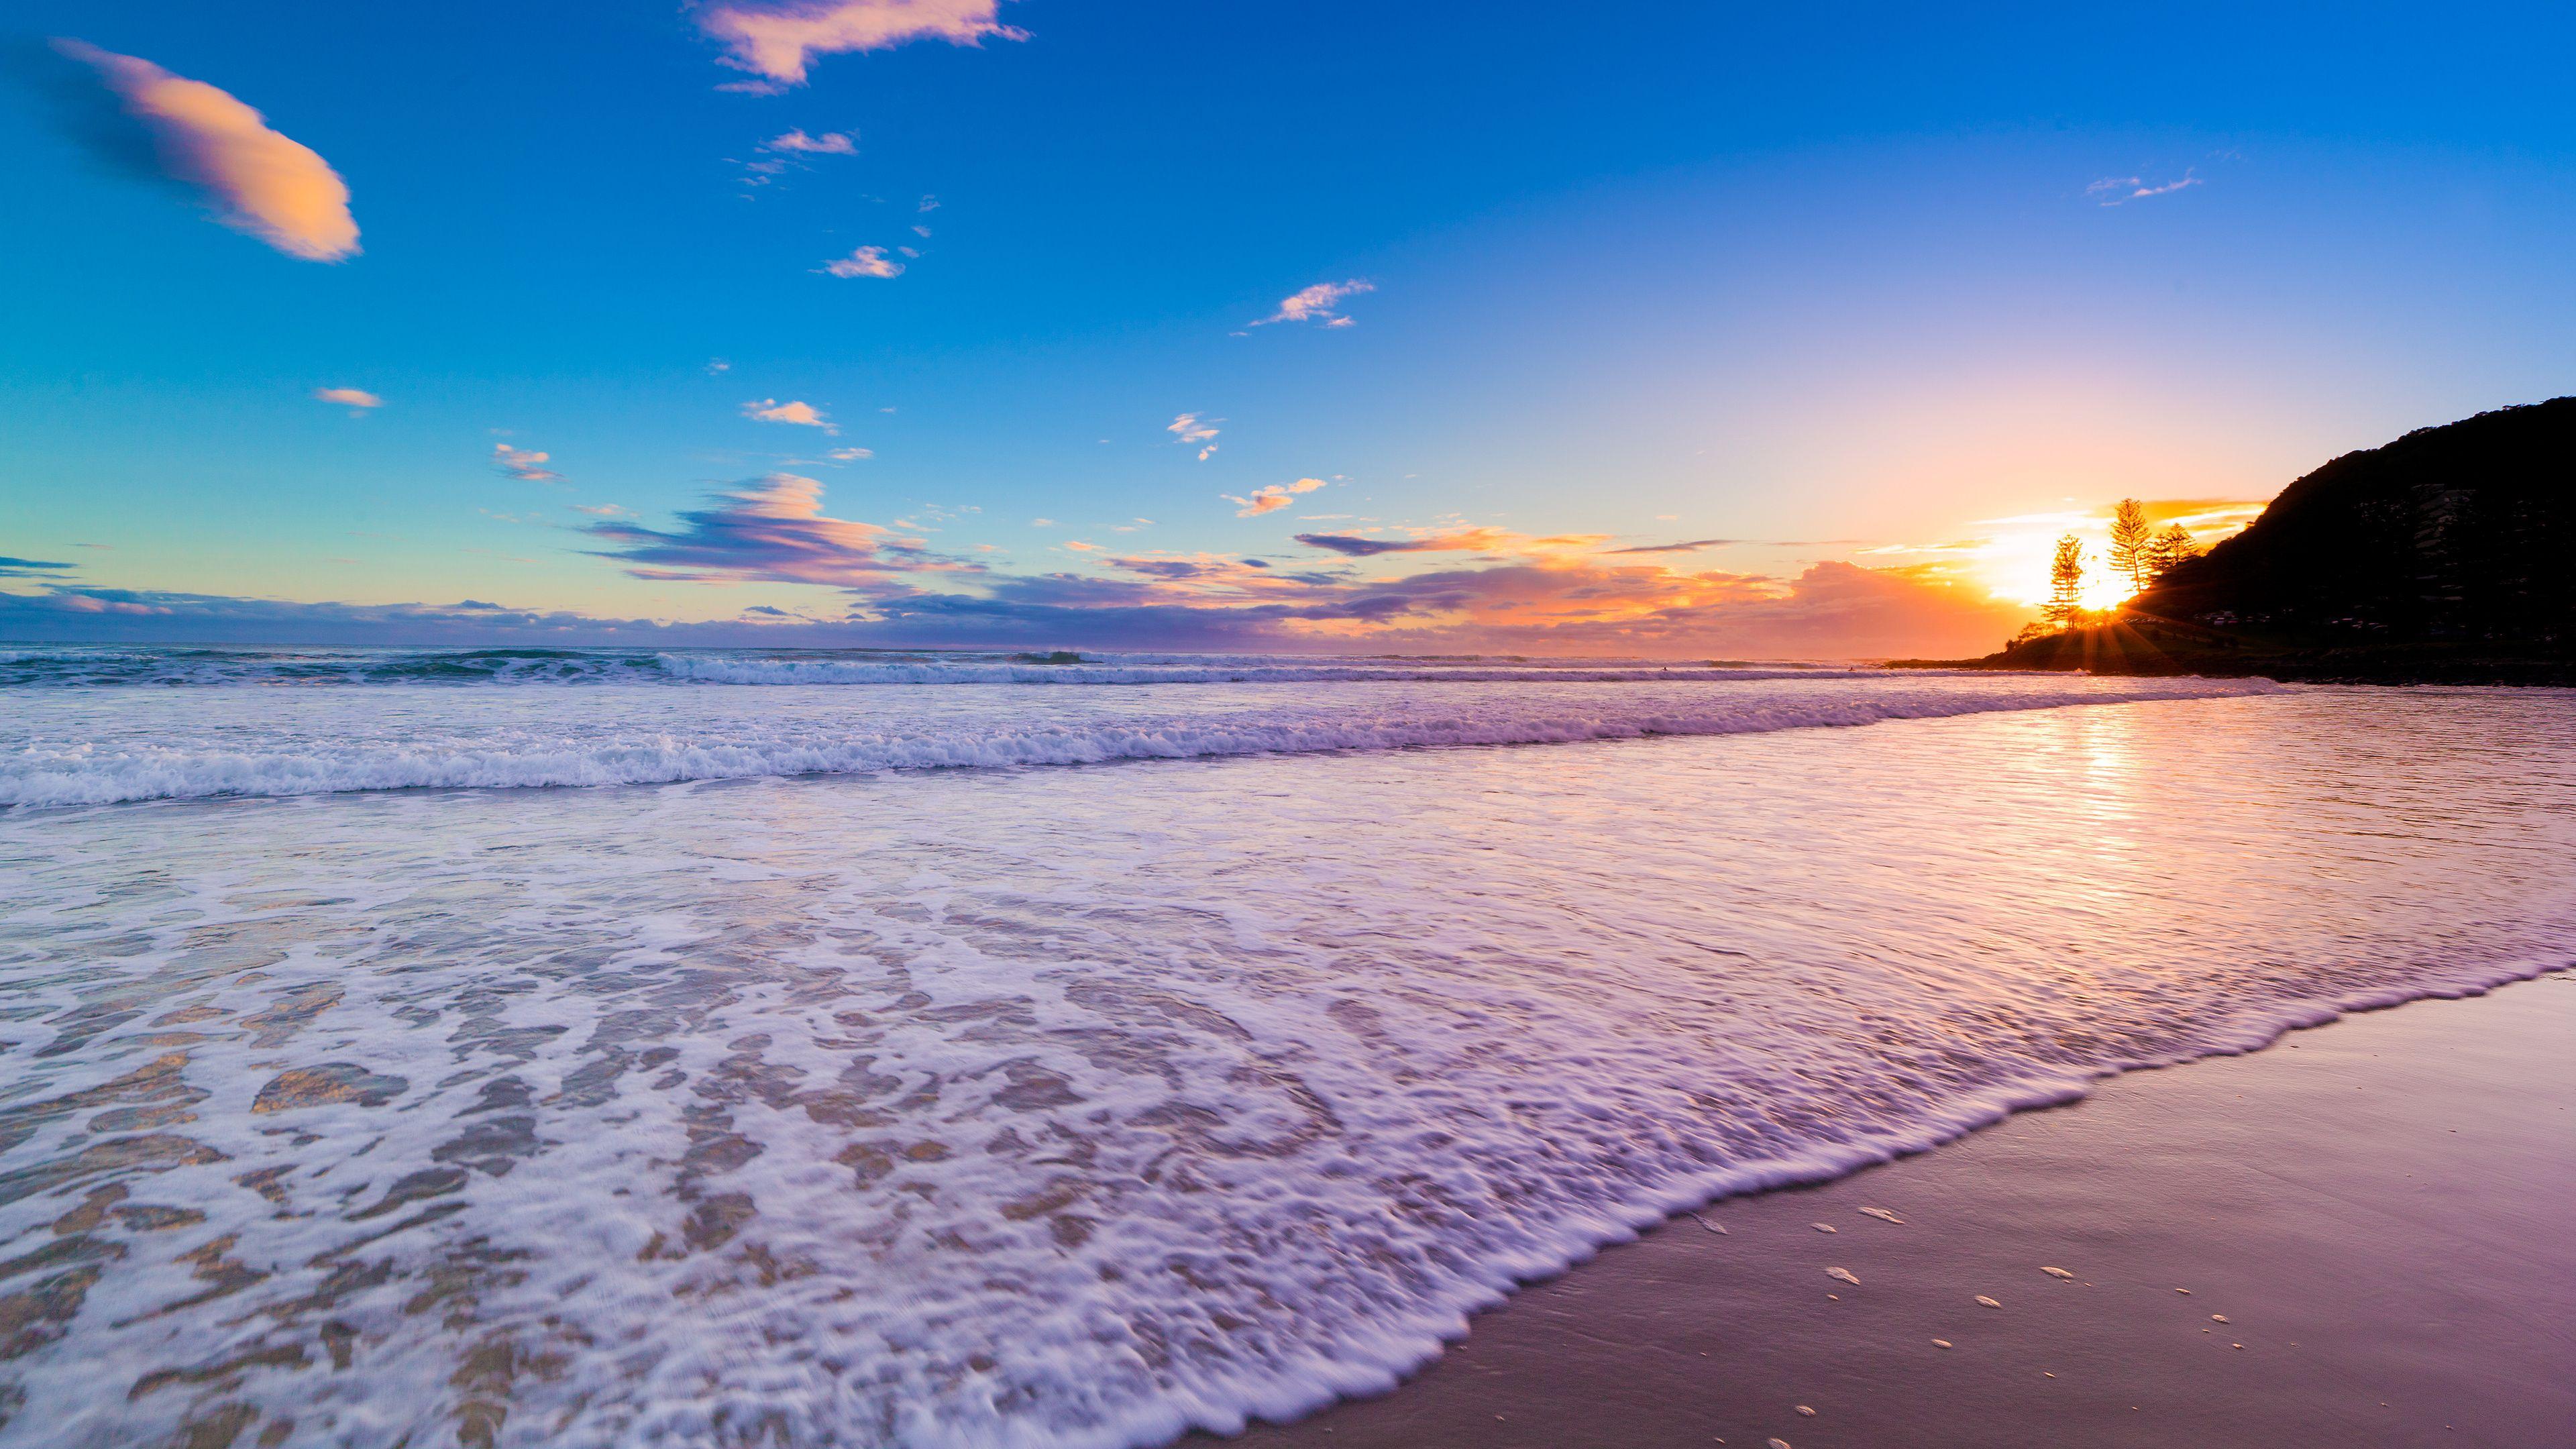 Gold Coast Australia Beach Sunset Wallpaper